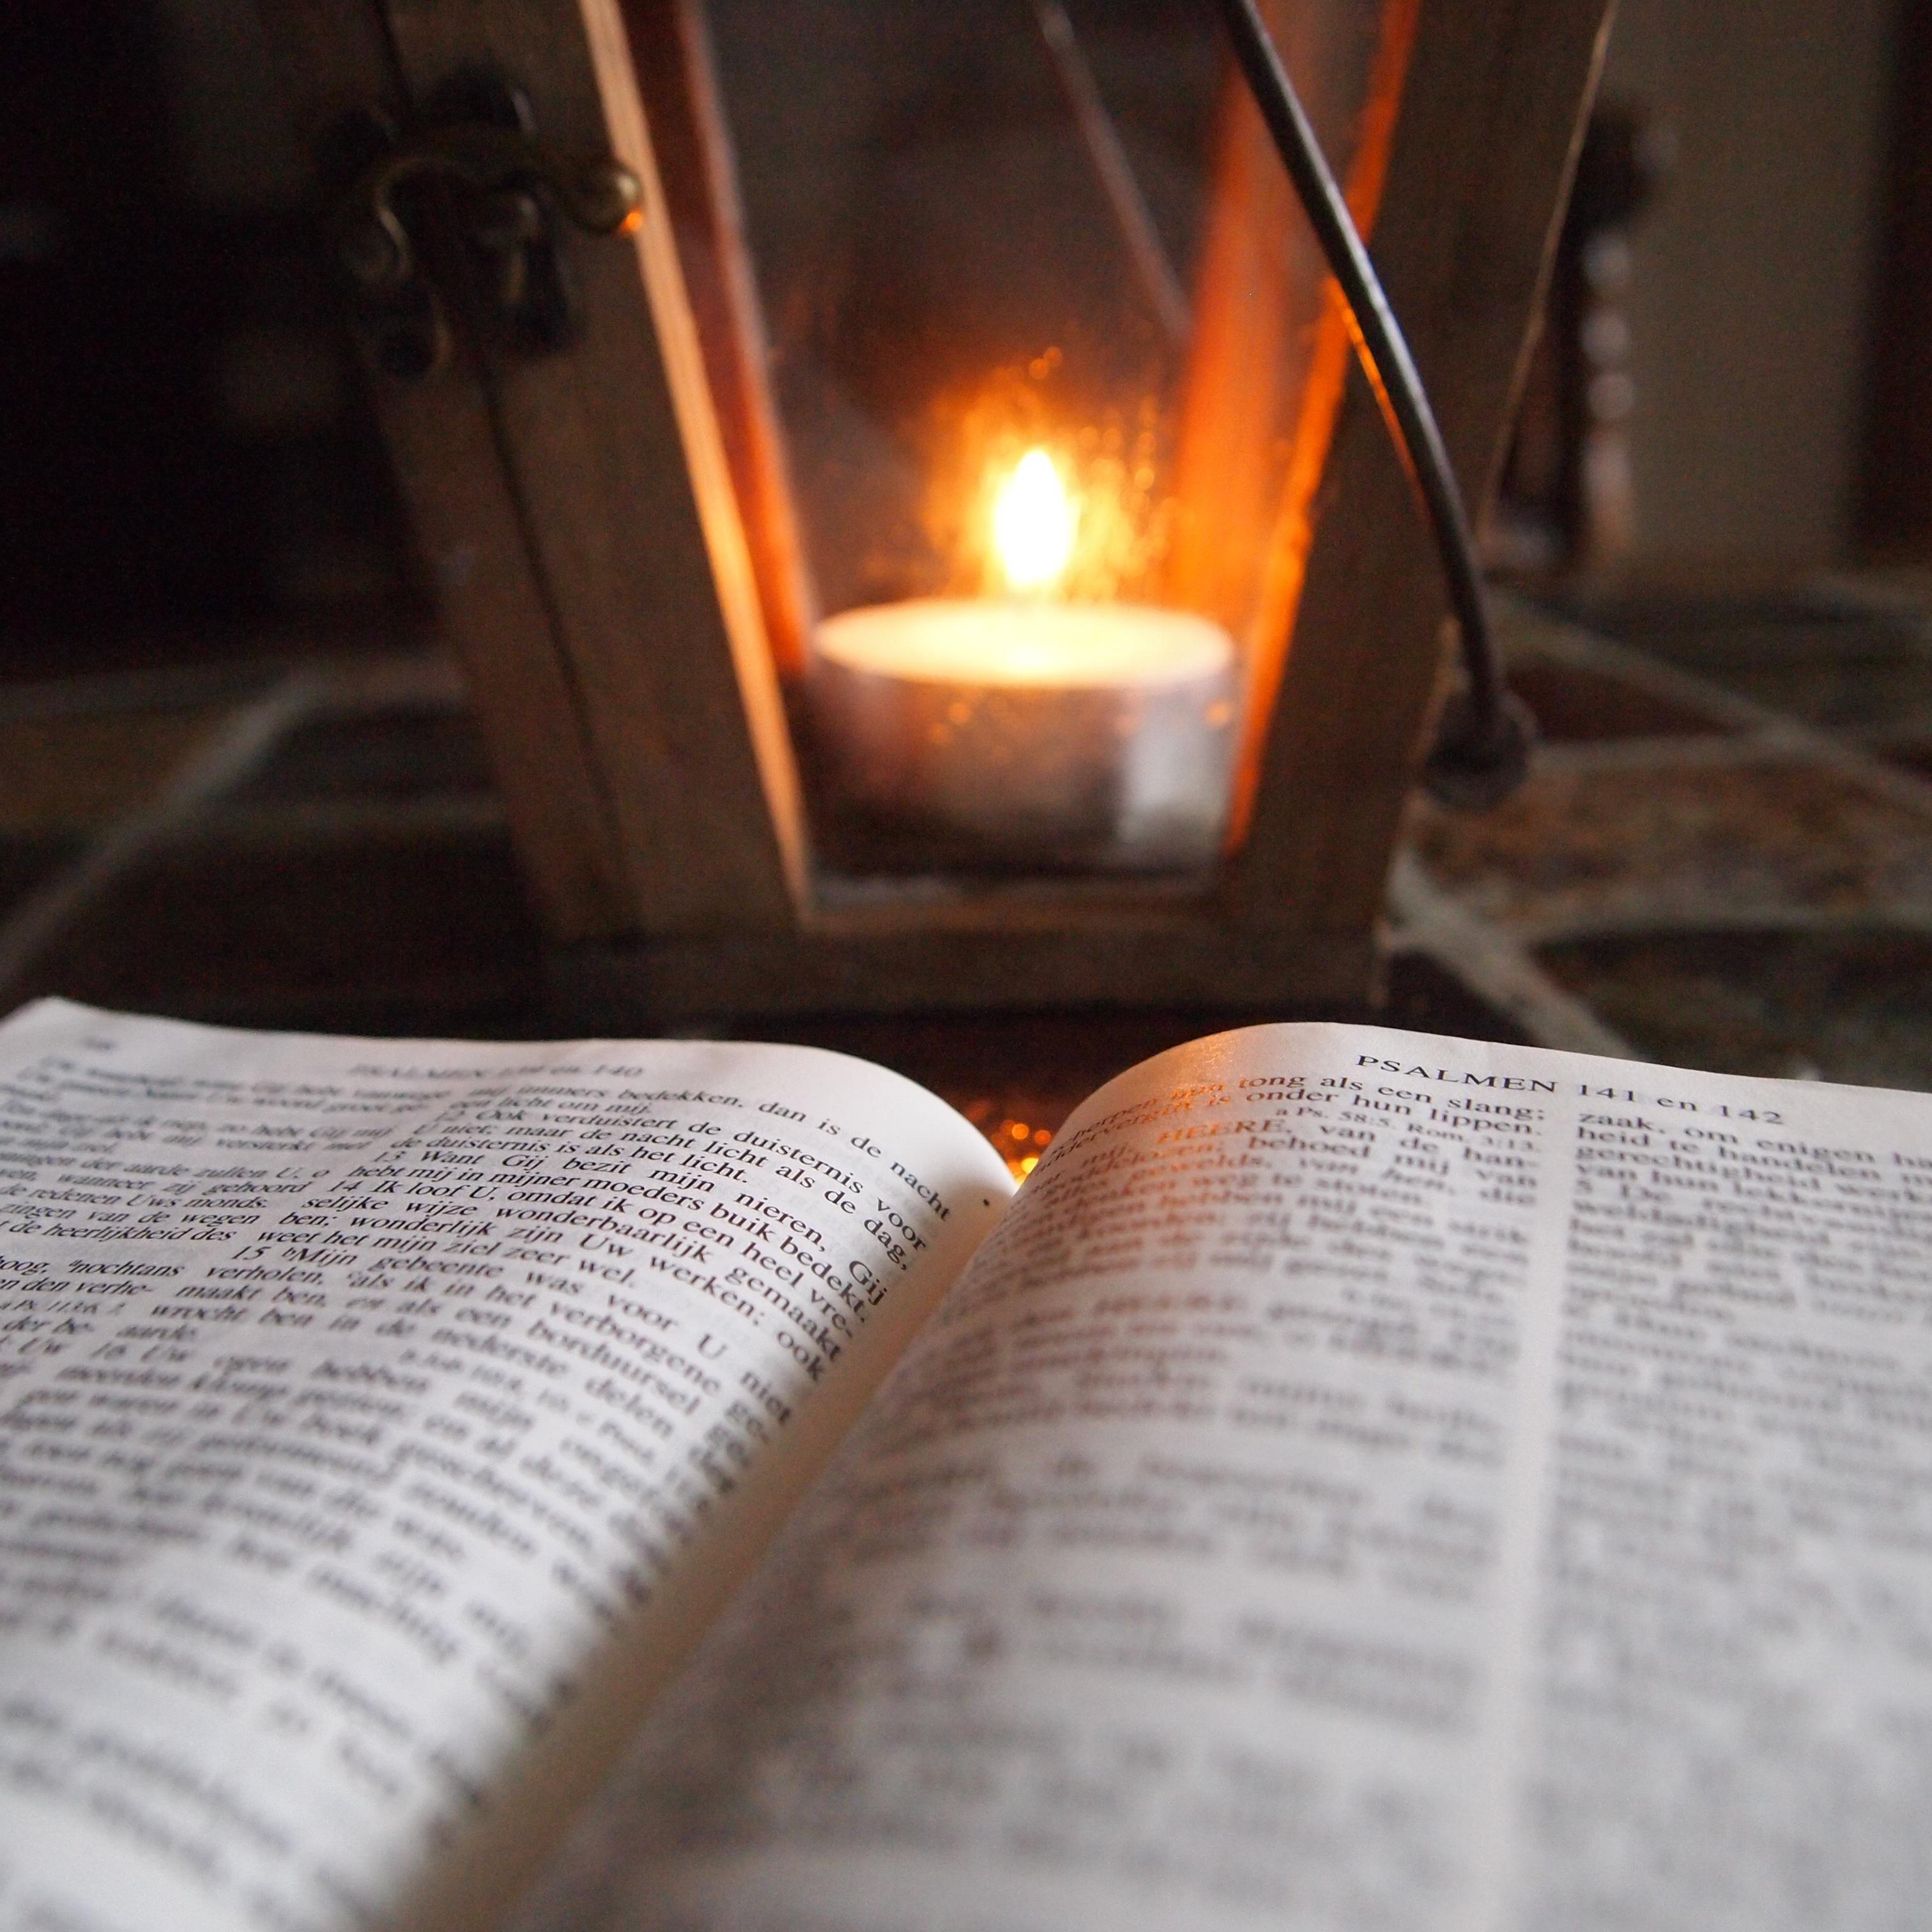 Kostenlose foto : Tabelle, Buch, lesen, Licht, Holz, Kerze ...